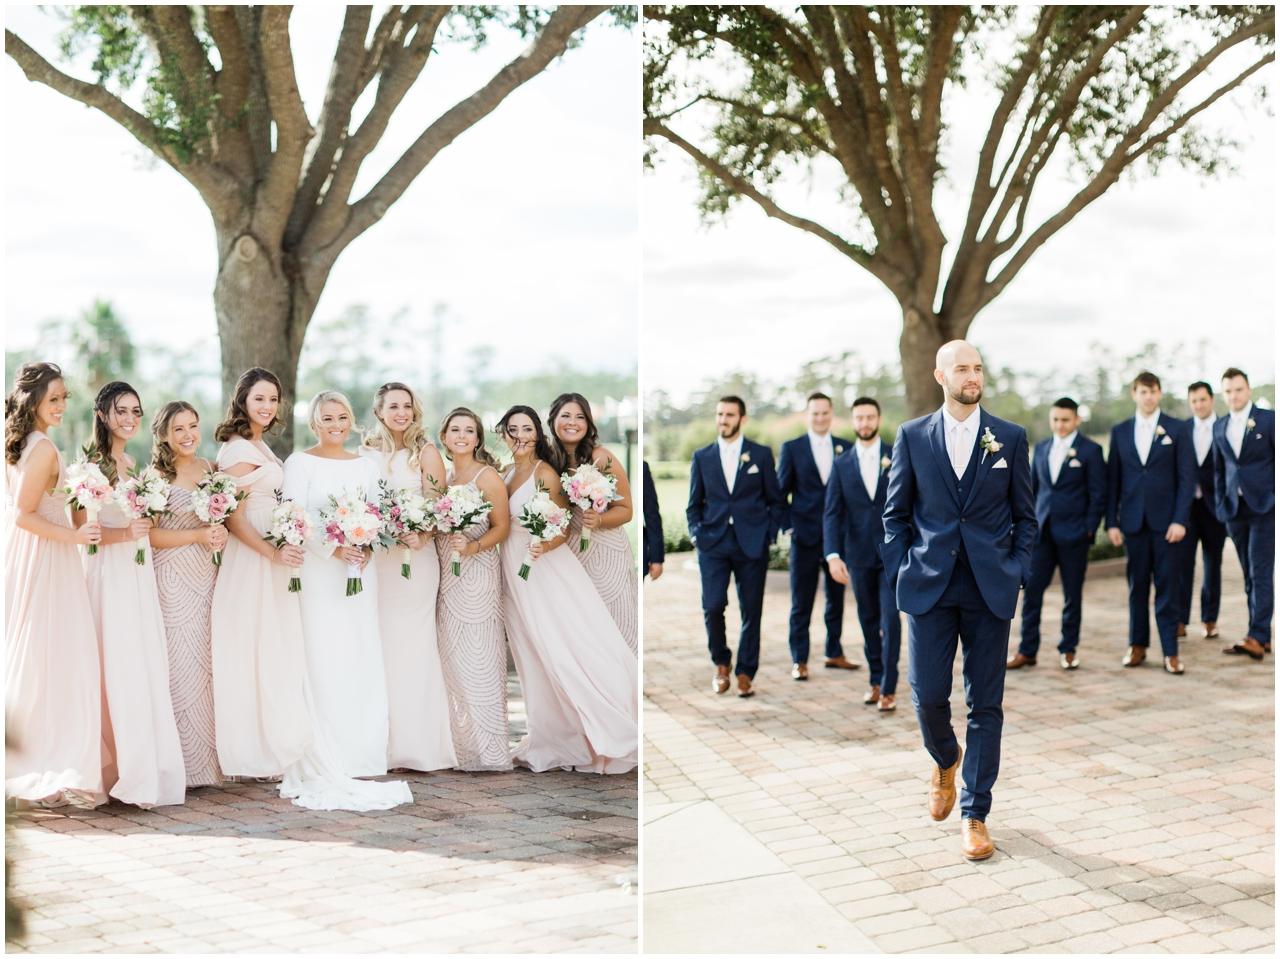 Jacksonville-Wedding-photographers-brooke-images-TPC-Sawgrass-Wedding-Mary-Kevin-blog_0014.jpg